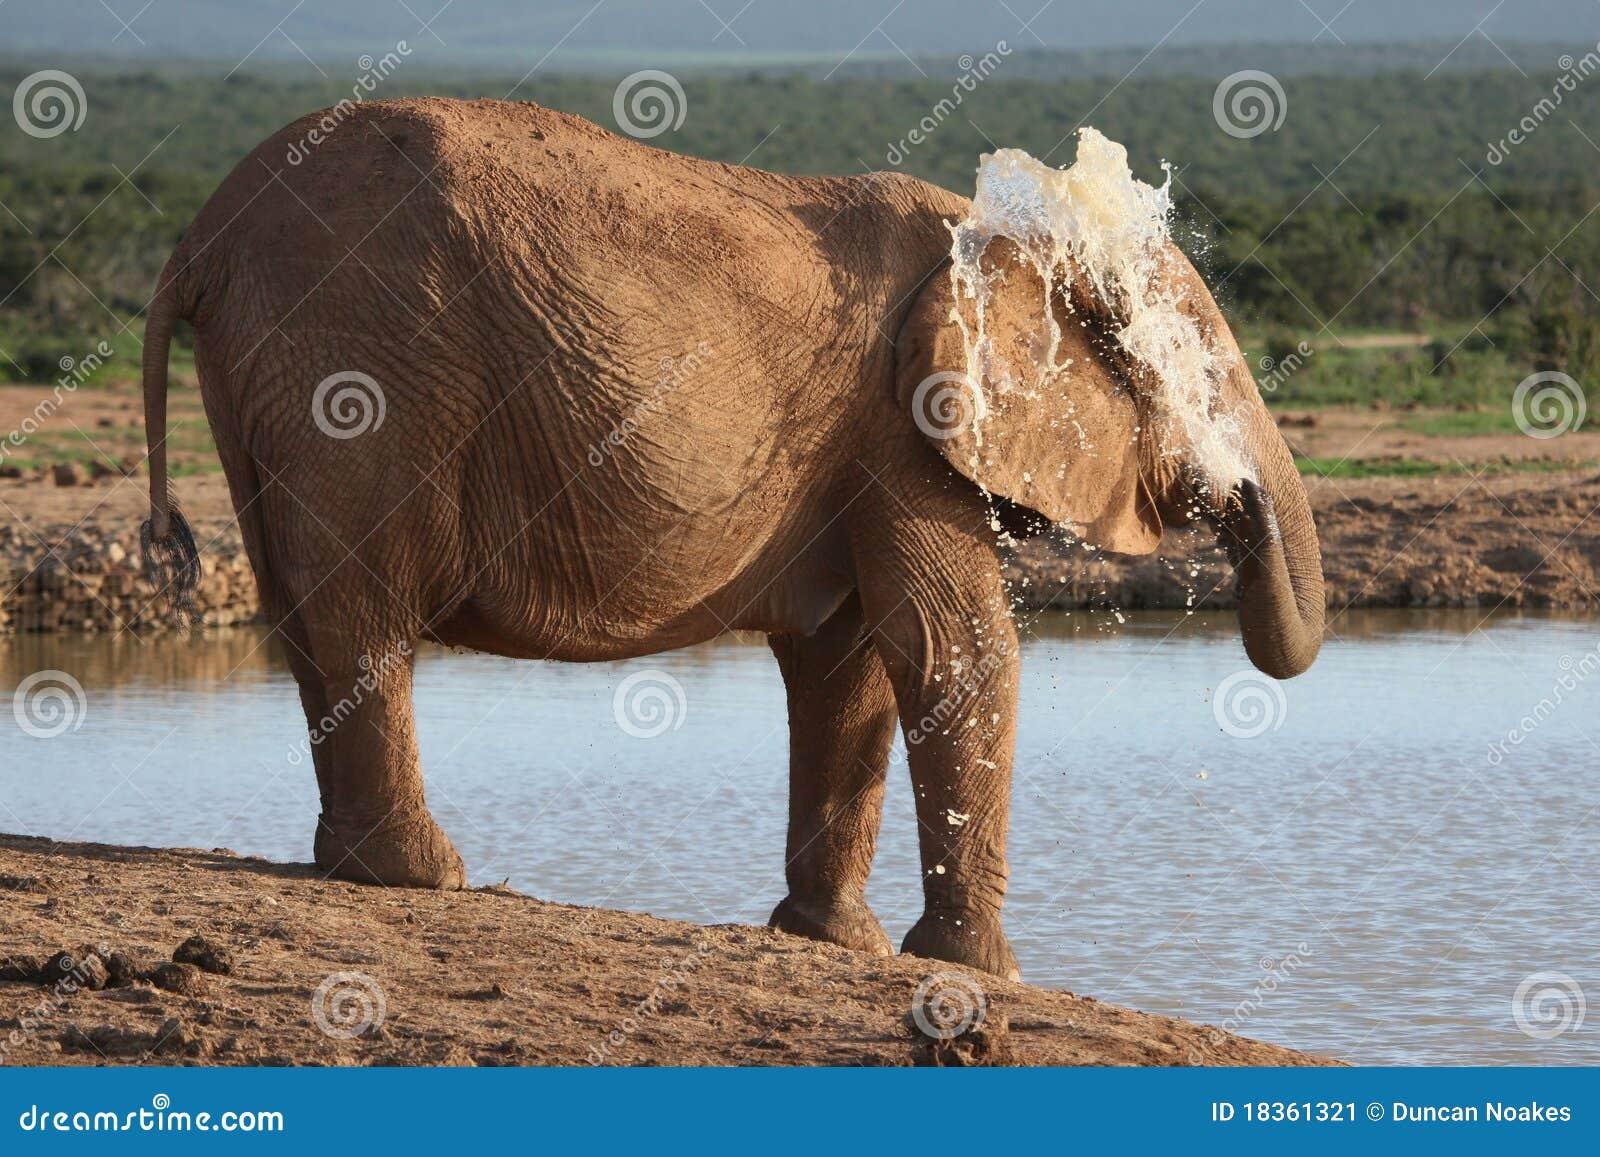 Elephant spraying water - photo#22